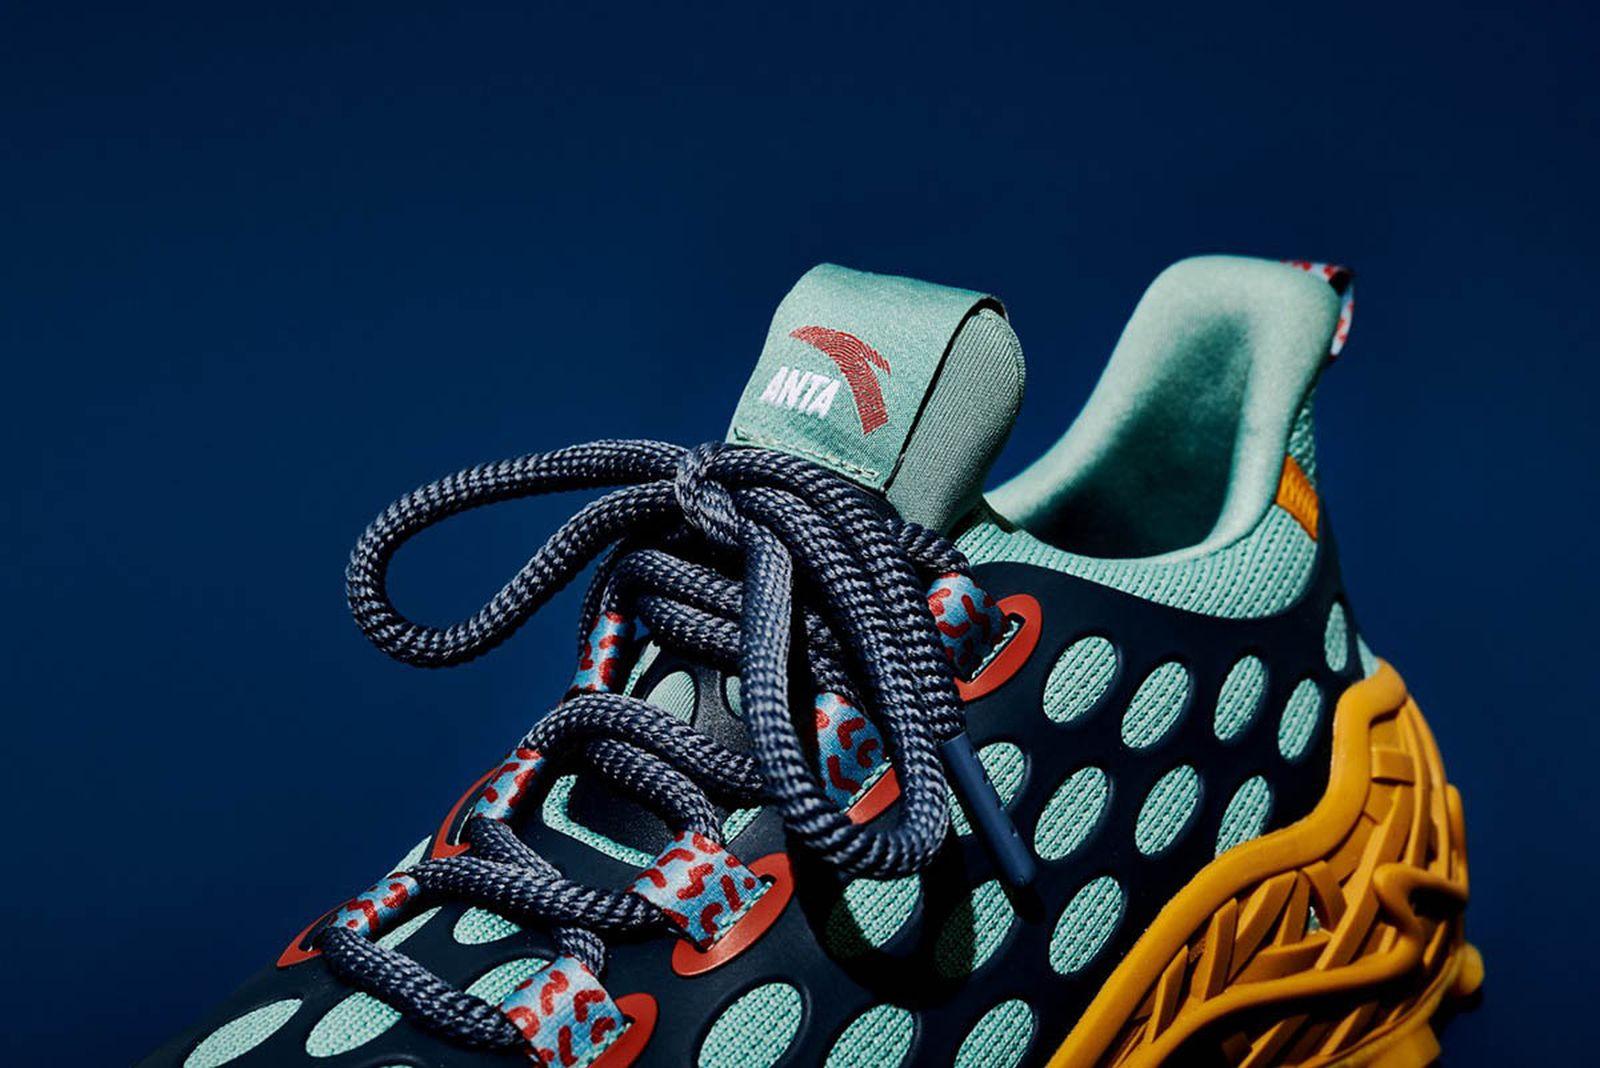 salehe-bembury-anta-sports-release-date-price-11